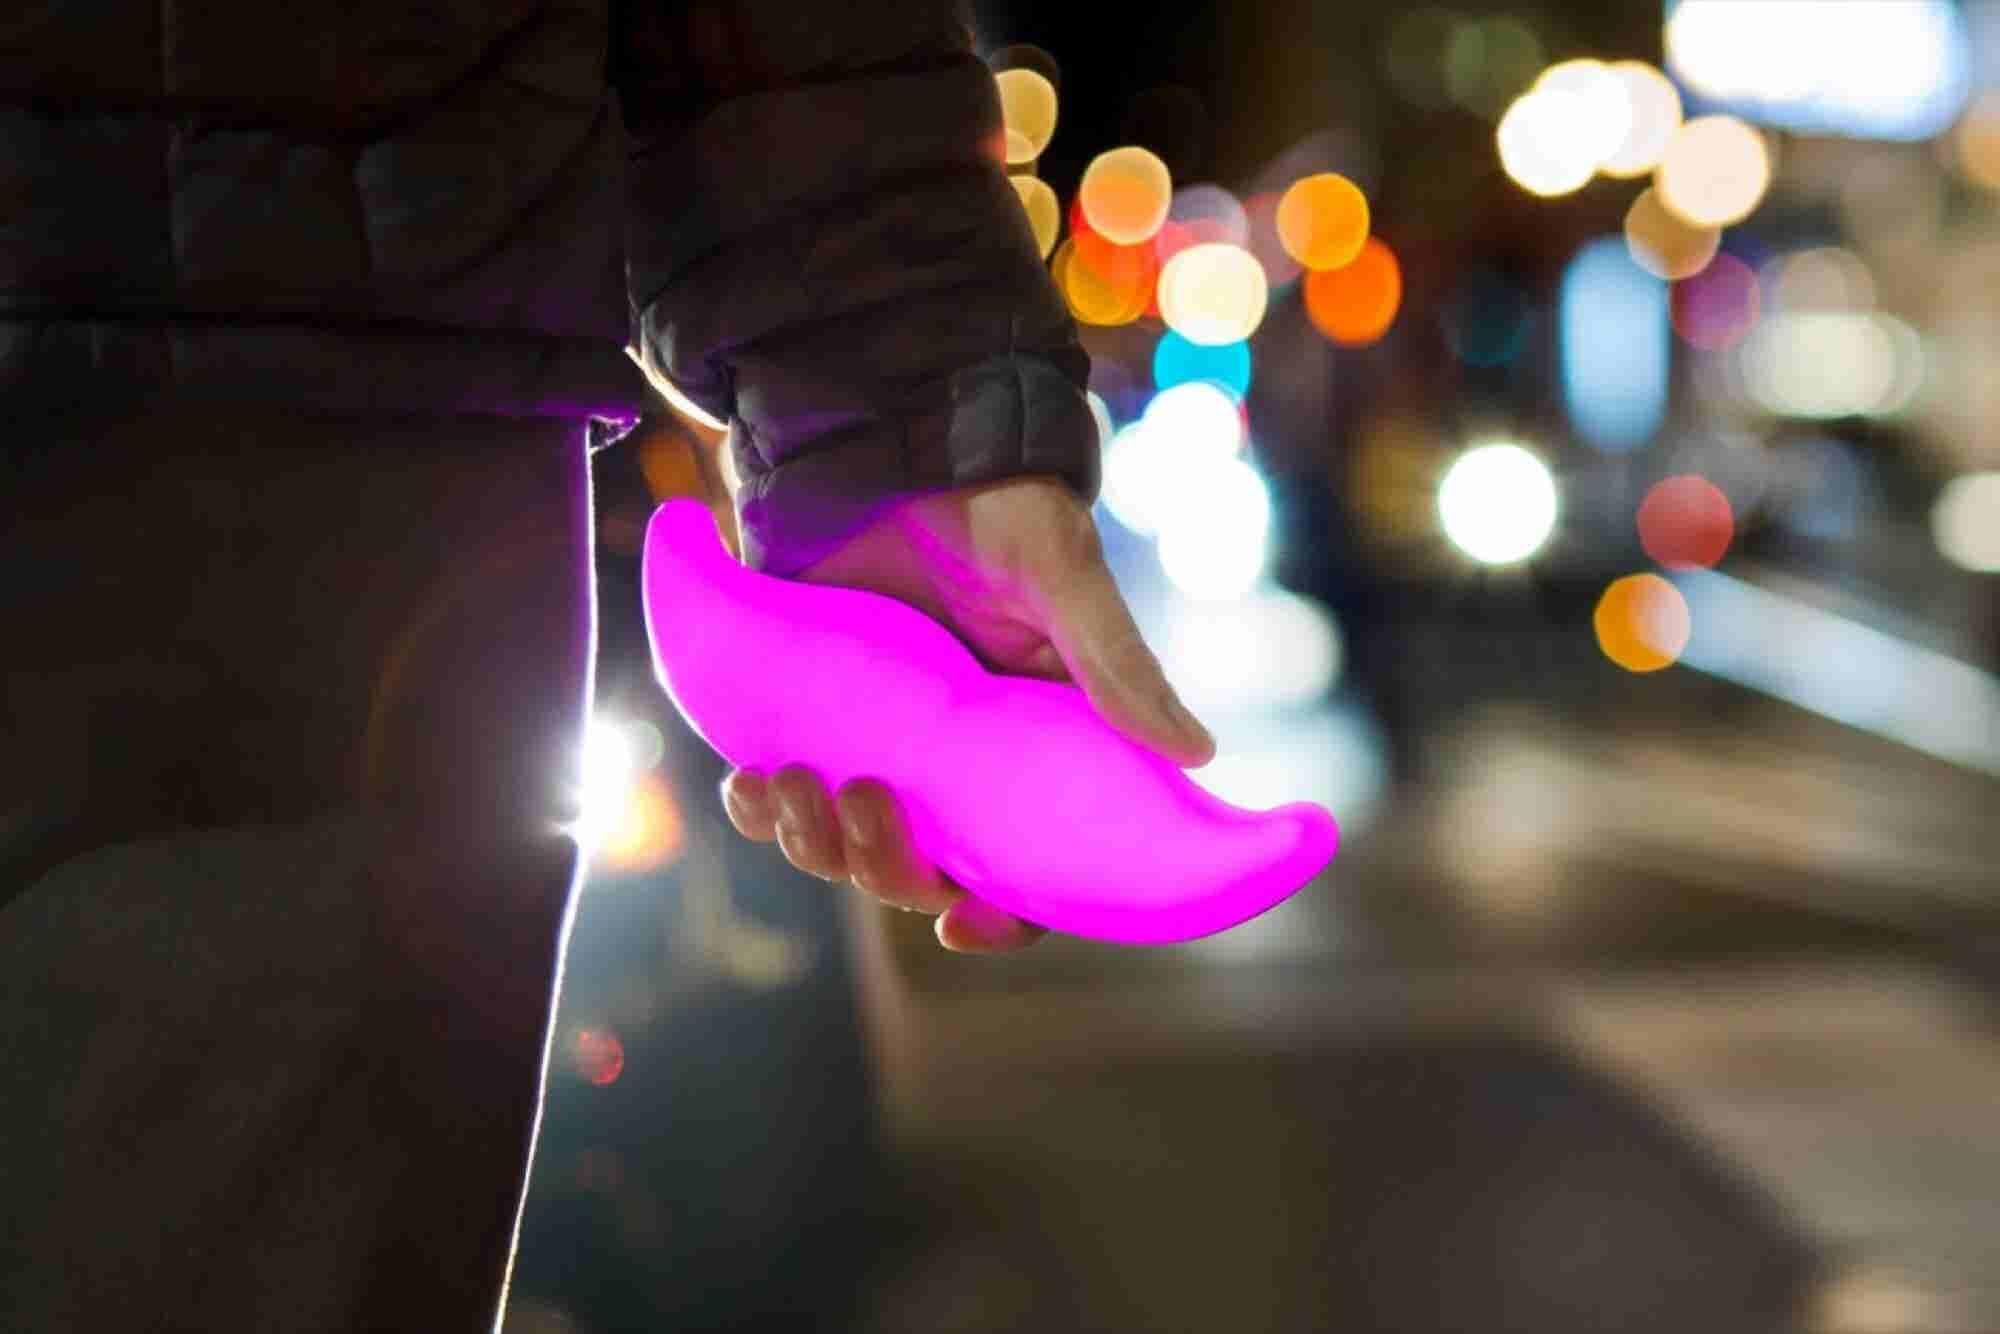 Lyft Announces Partnership With China's Largest Ridesharing Company